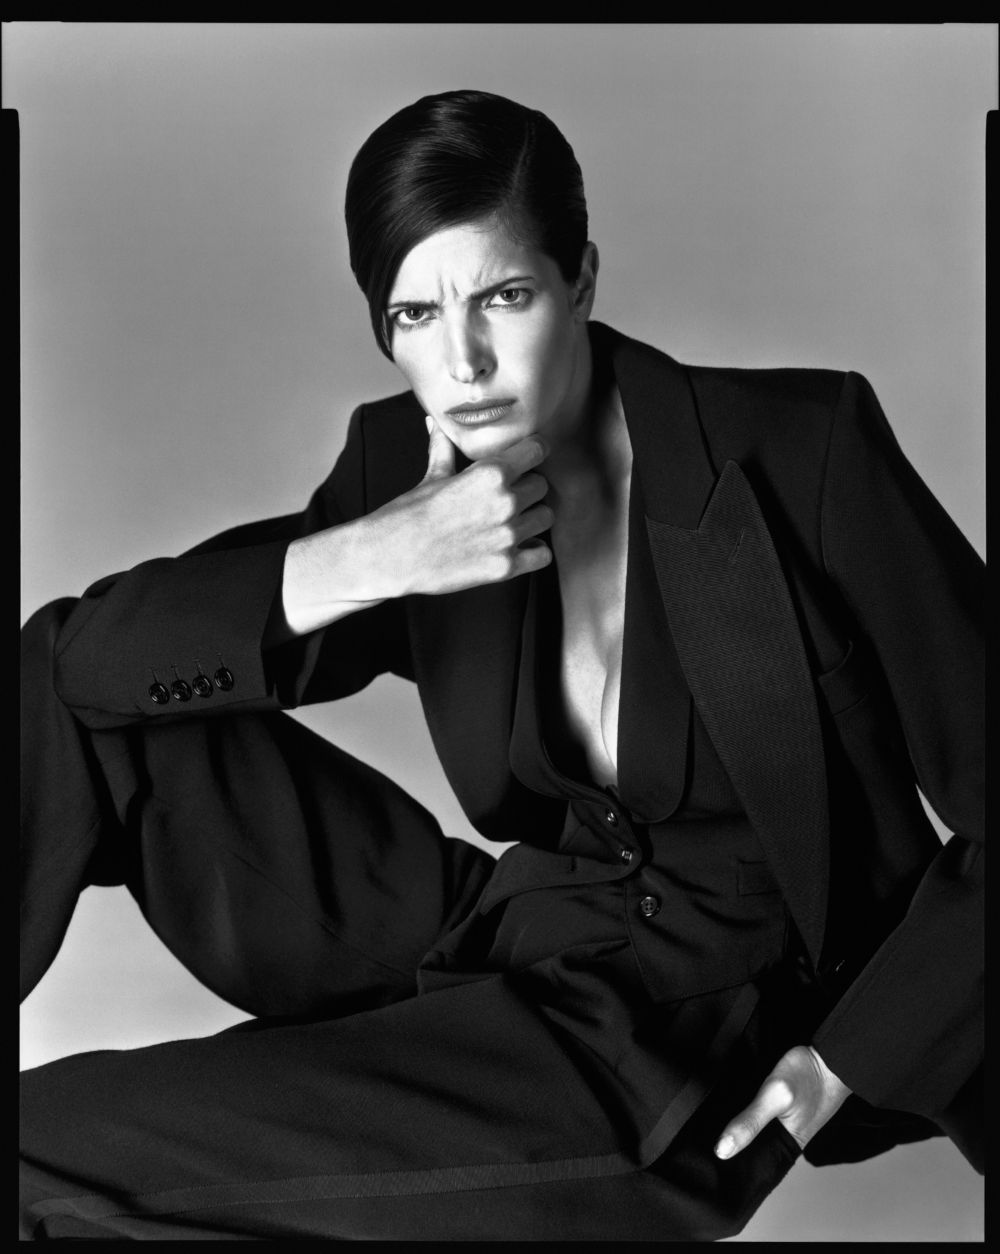 Stephanie Seymour, tuxedo by Yves Saint Laurent, New York